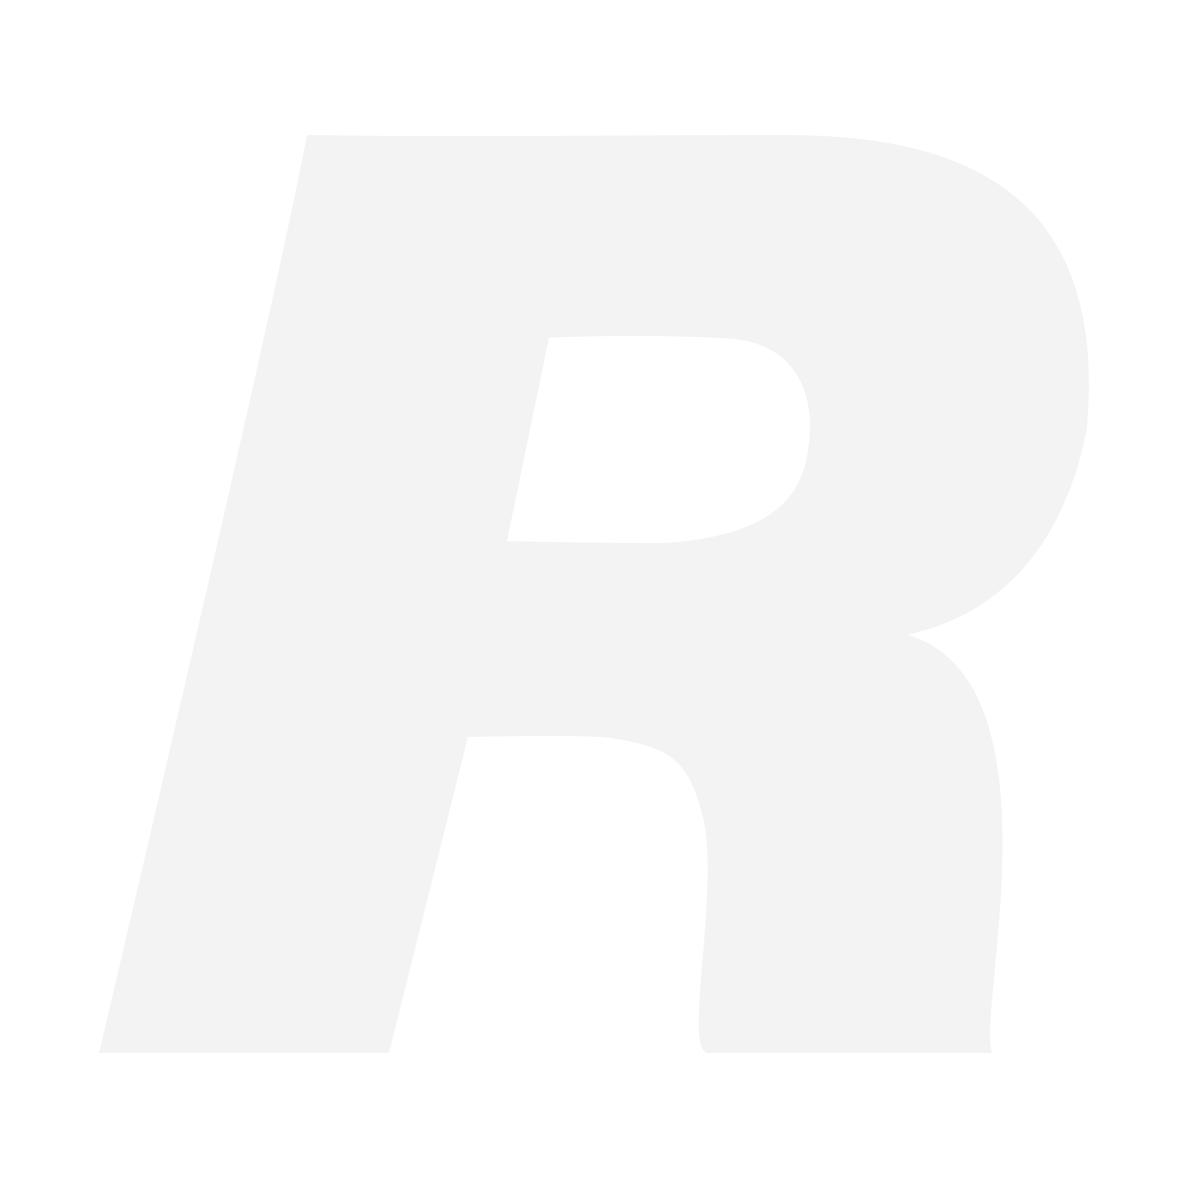 Fujifilm RDP Provia 100F 135-36